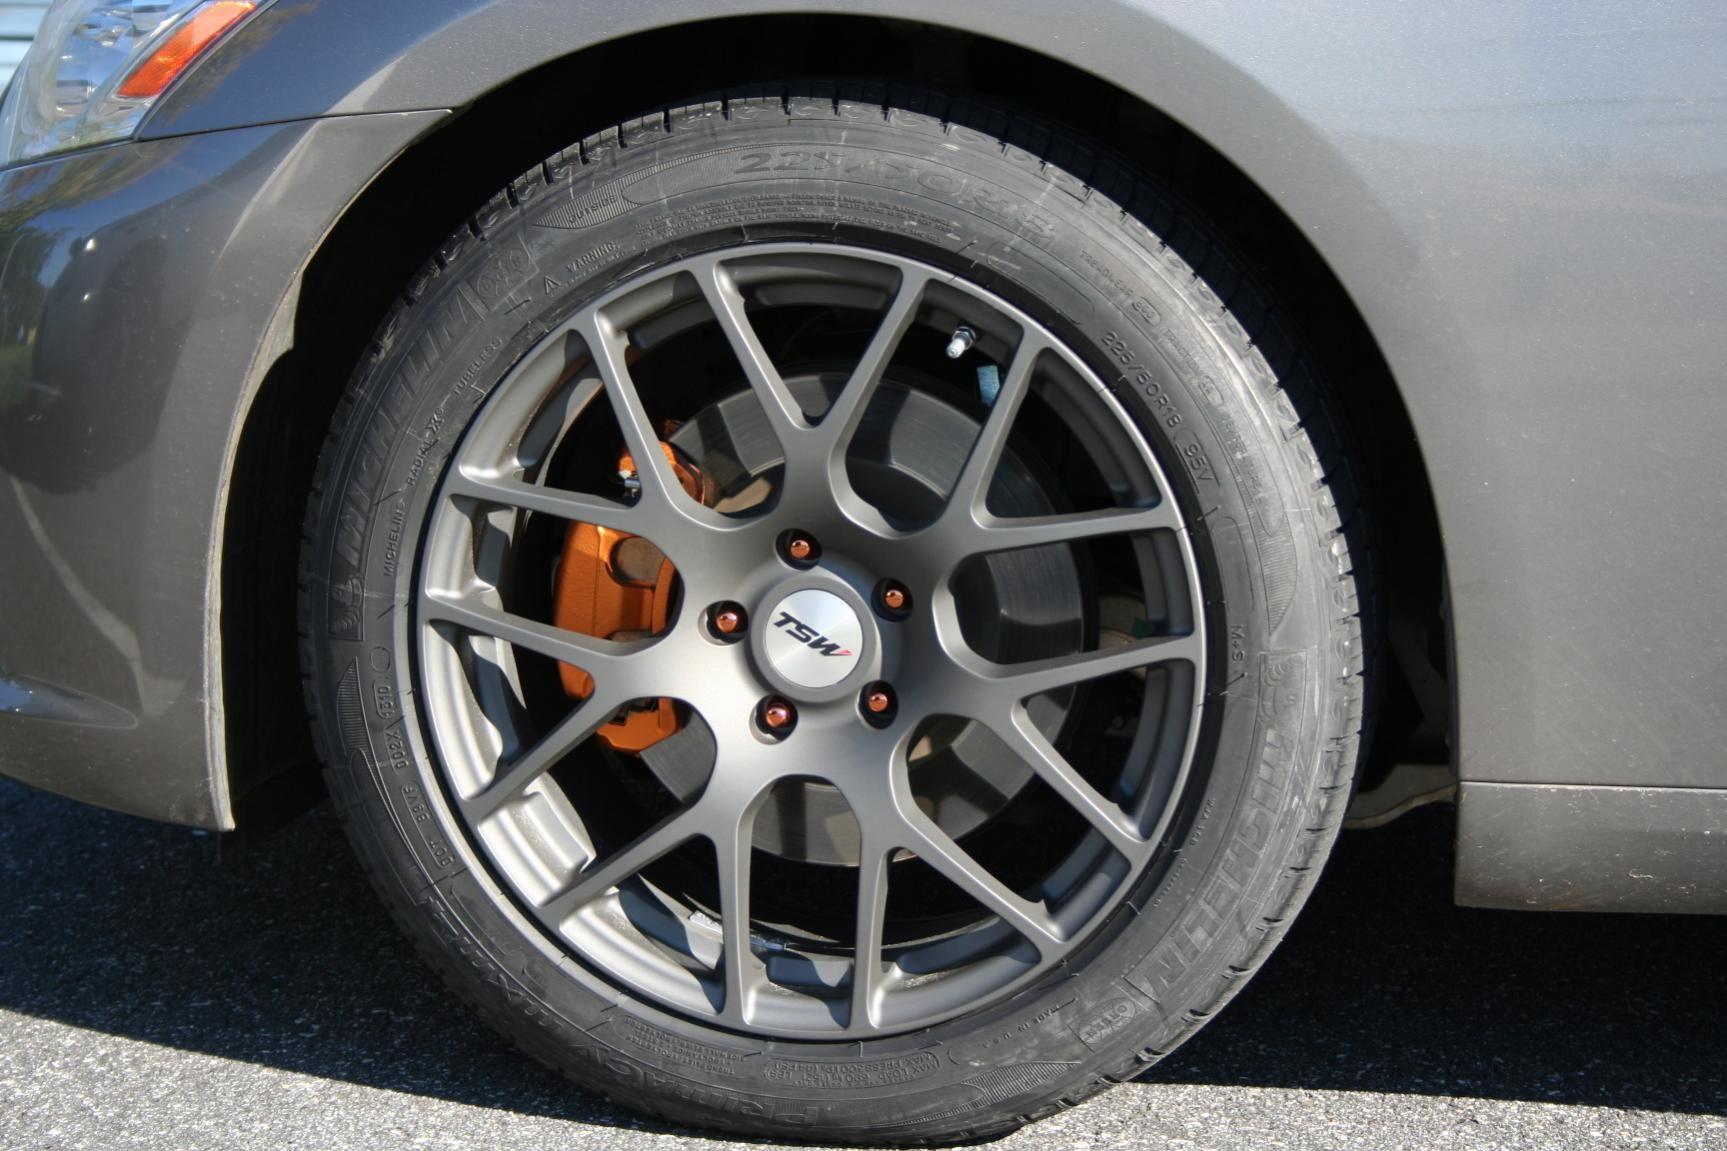 23 Painted Brake Caliper Ideas Calipers Brake Calipers Brake